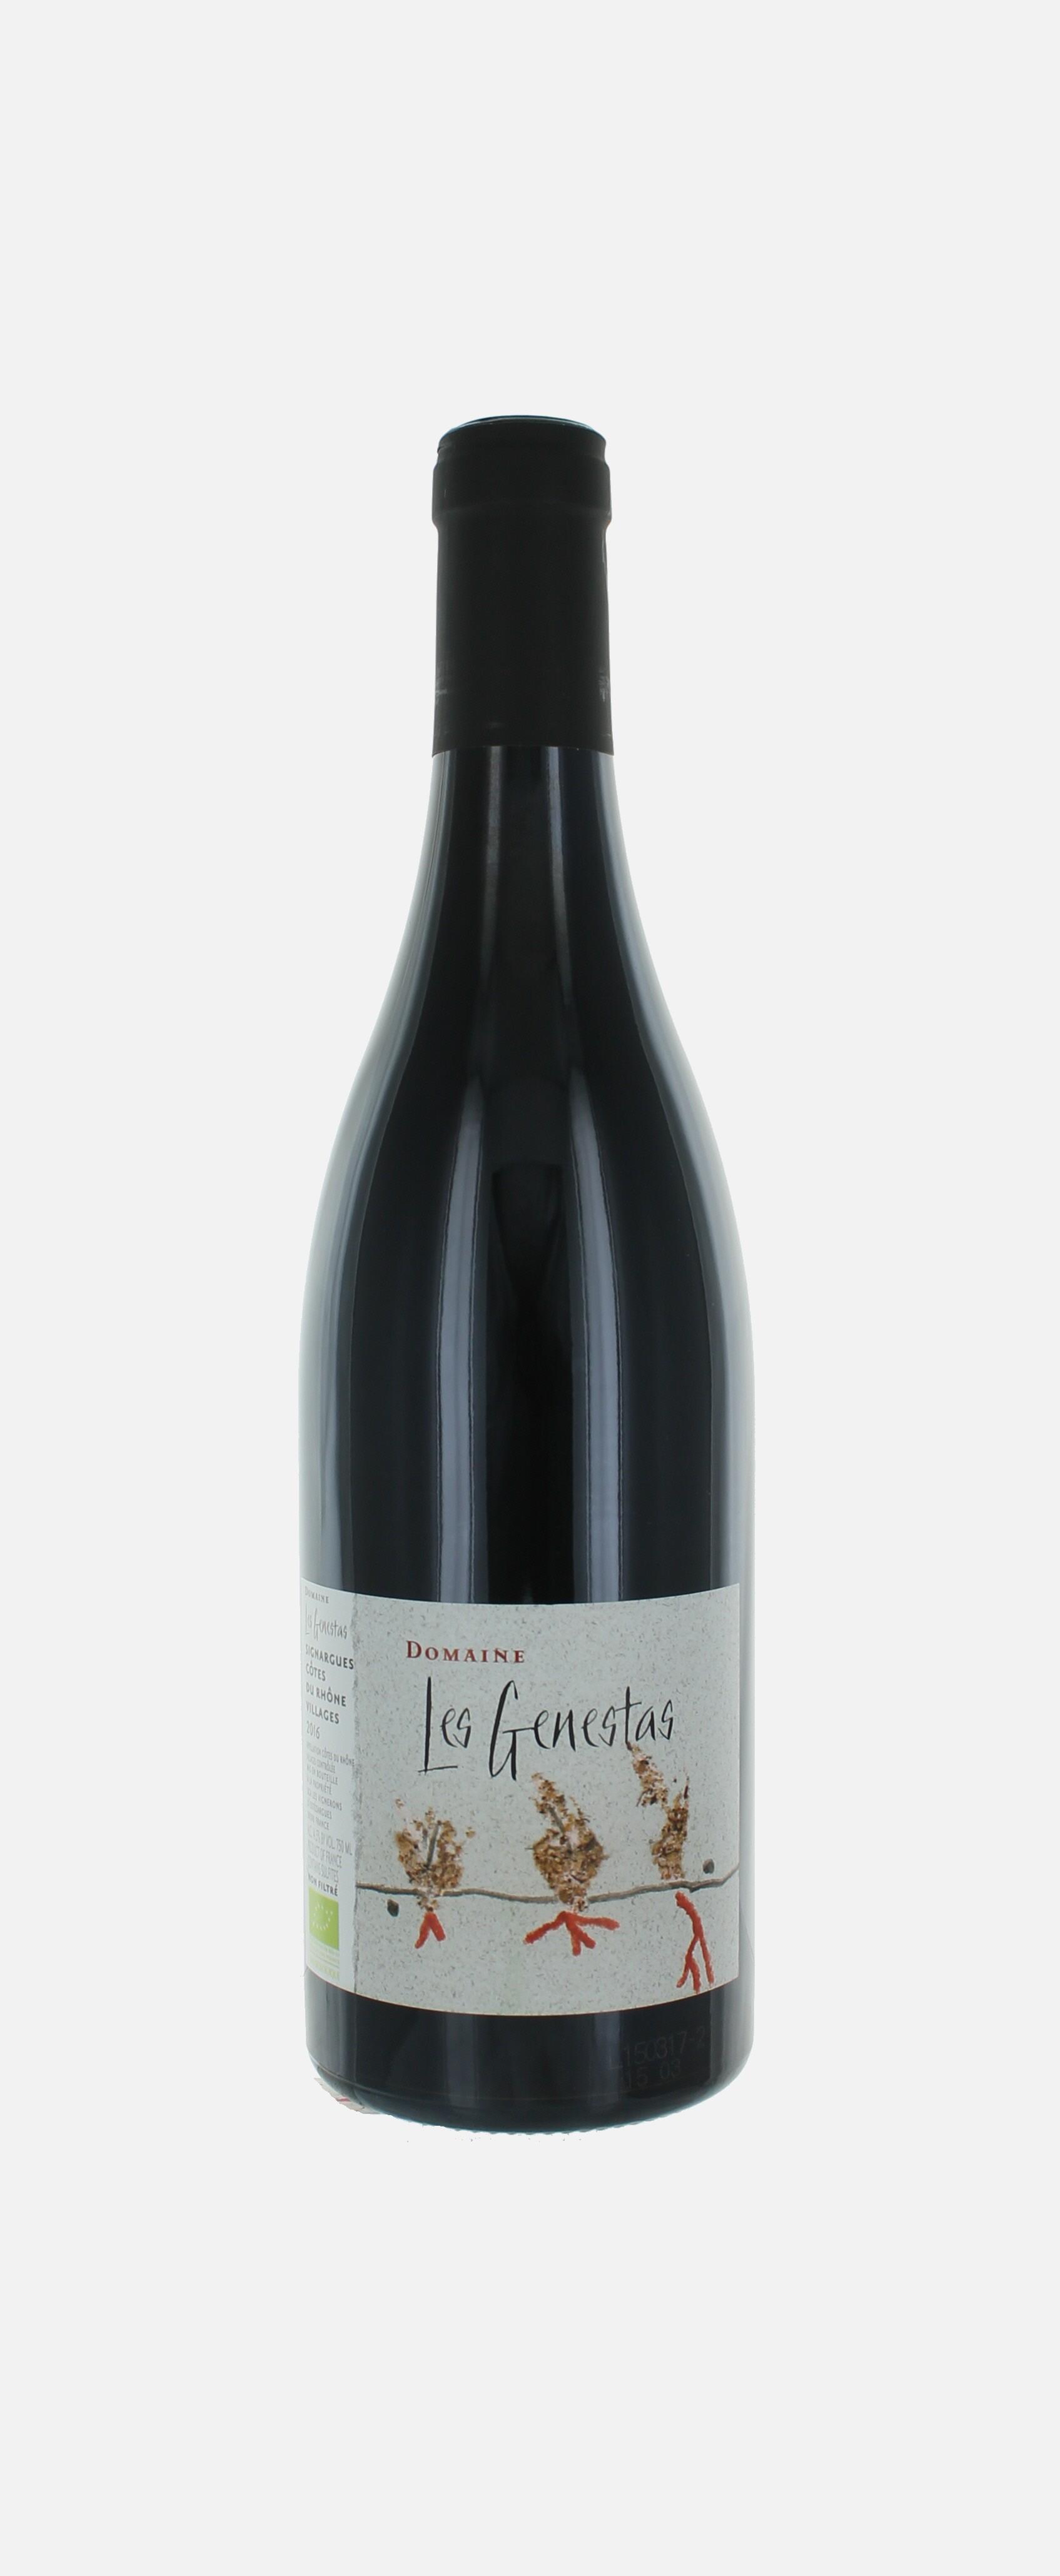 Les Genestas,Côtes du rhône,  Estézargues